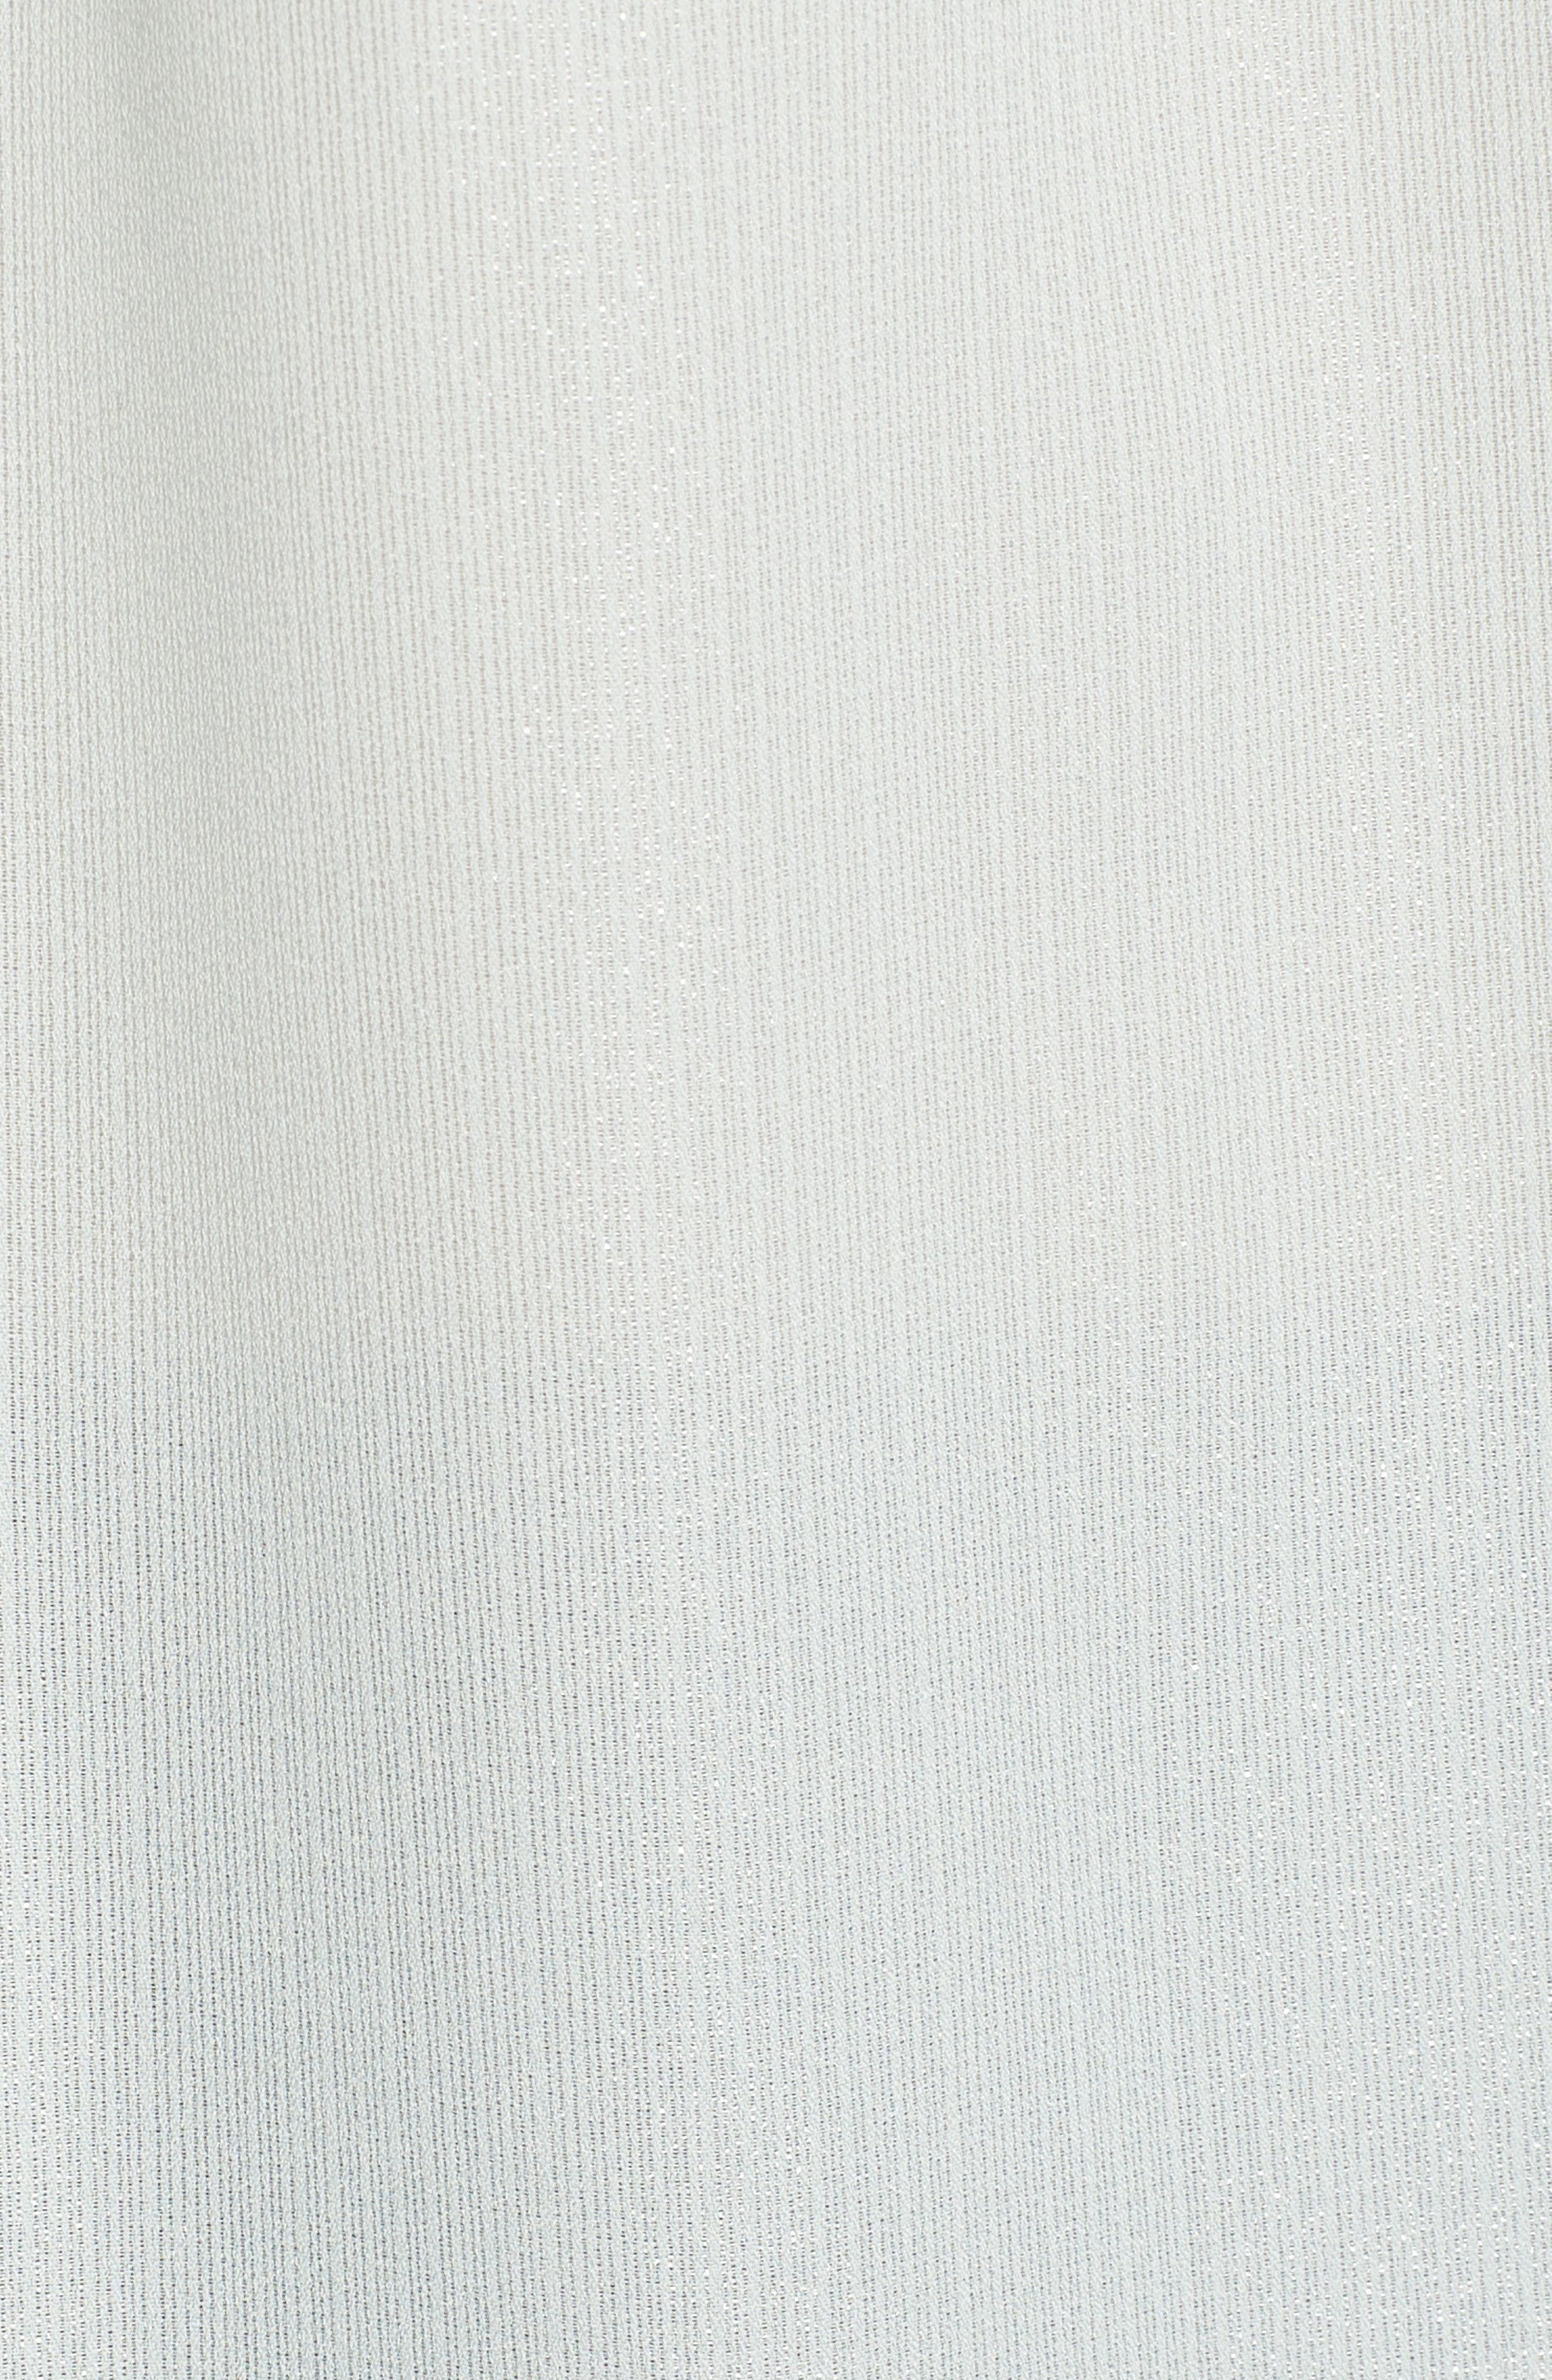 Tie Neck Shimmer Top,                             Alternate thumbnail 5, color,                             BLUE GREY SHIMMER